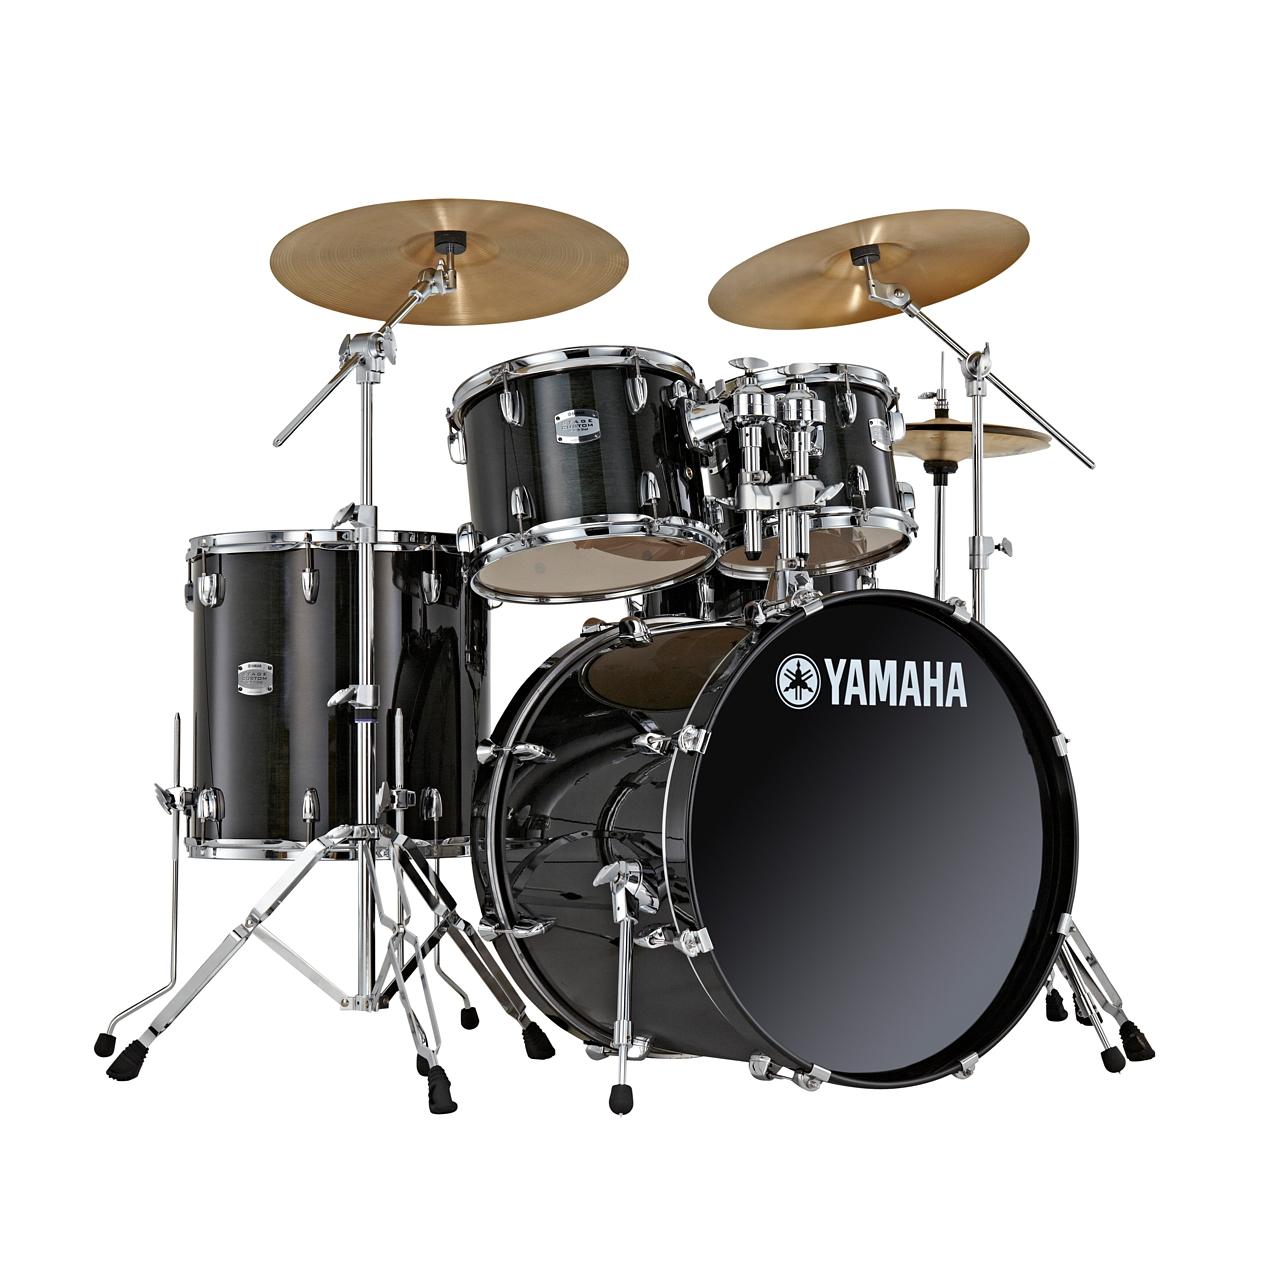 "Yamaha Stage Custom Birch 20"" Raven Black Schlagzeugset inkl. Hardware"